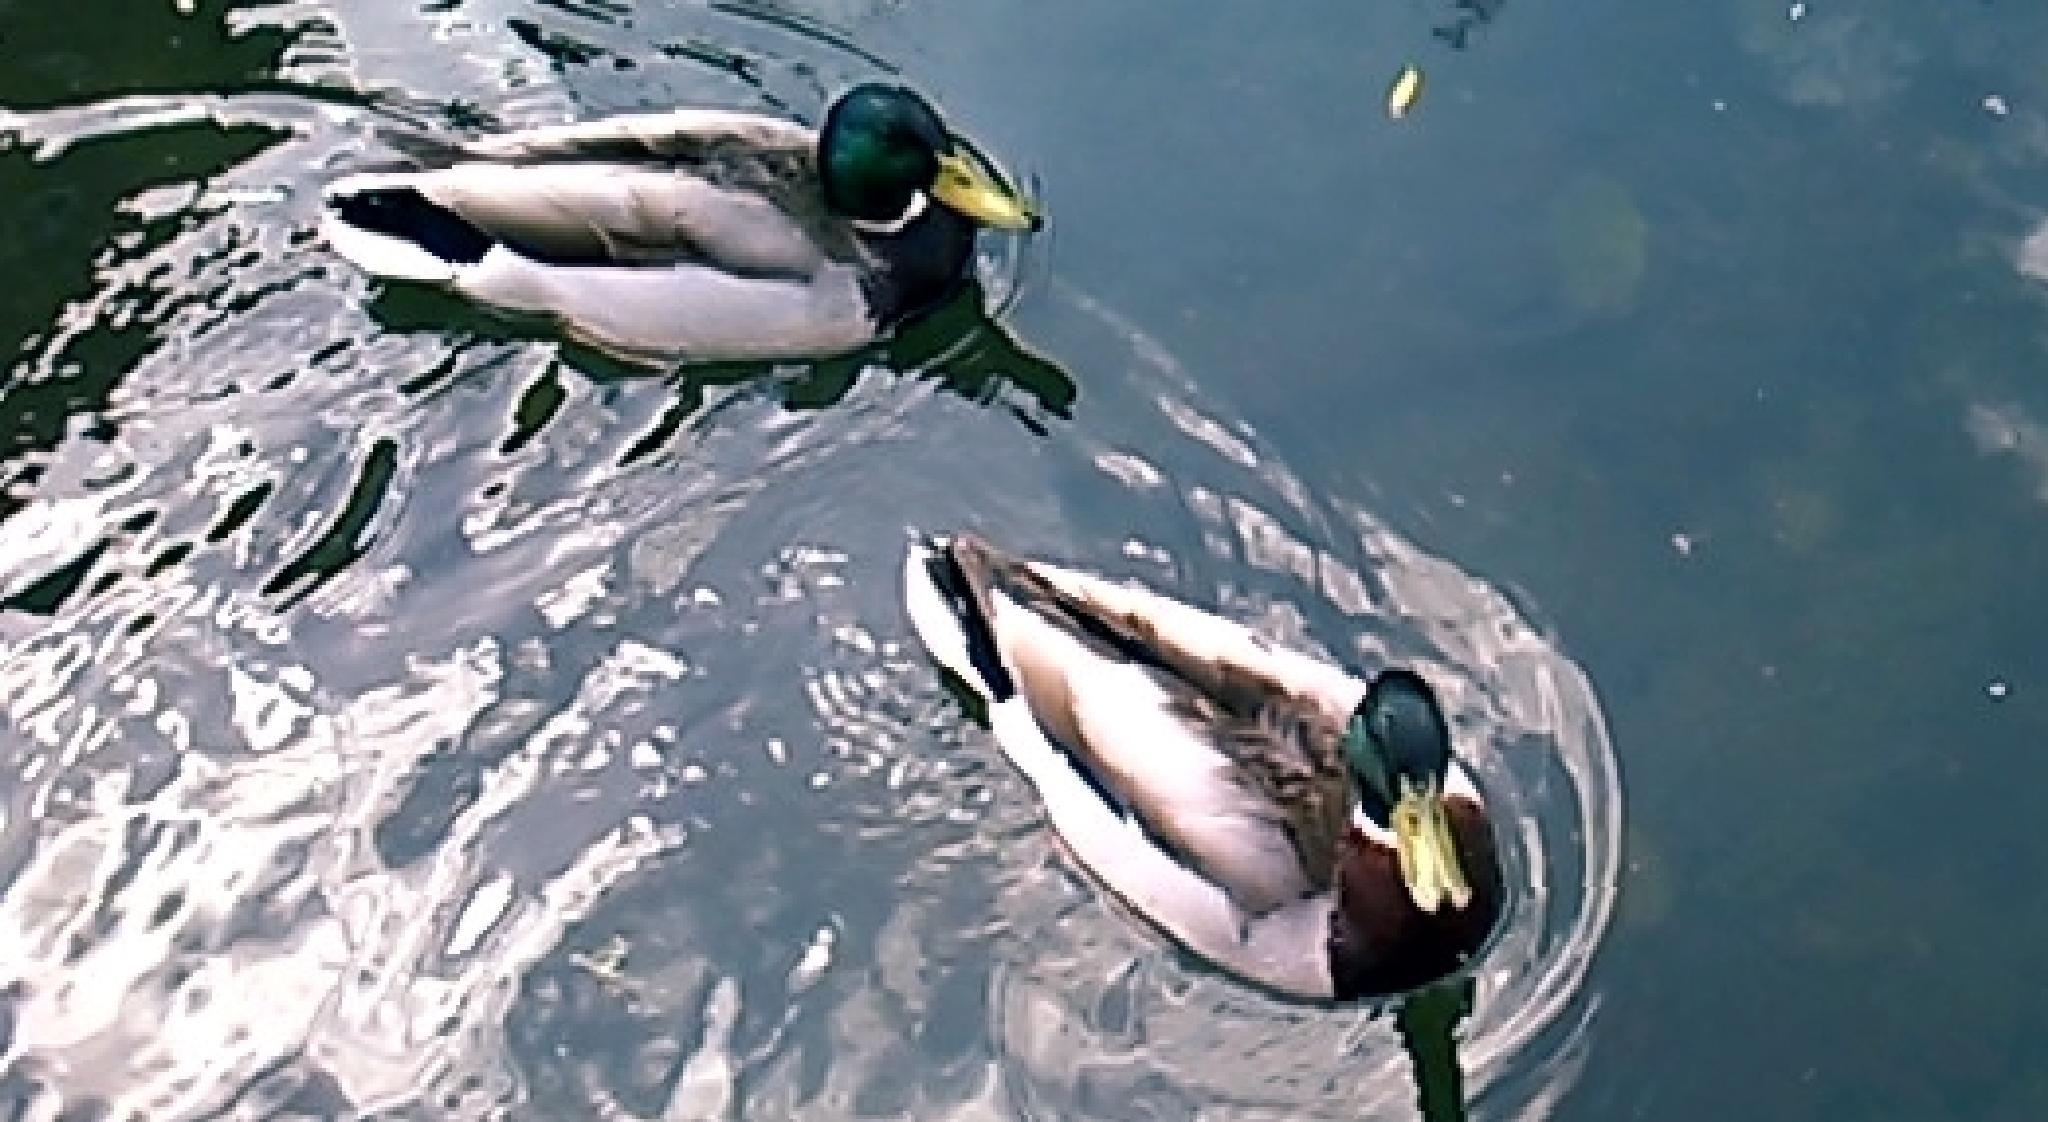 Ducks by gemma smith